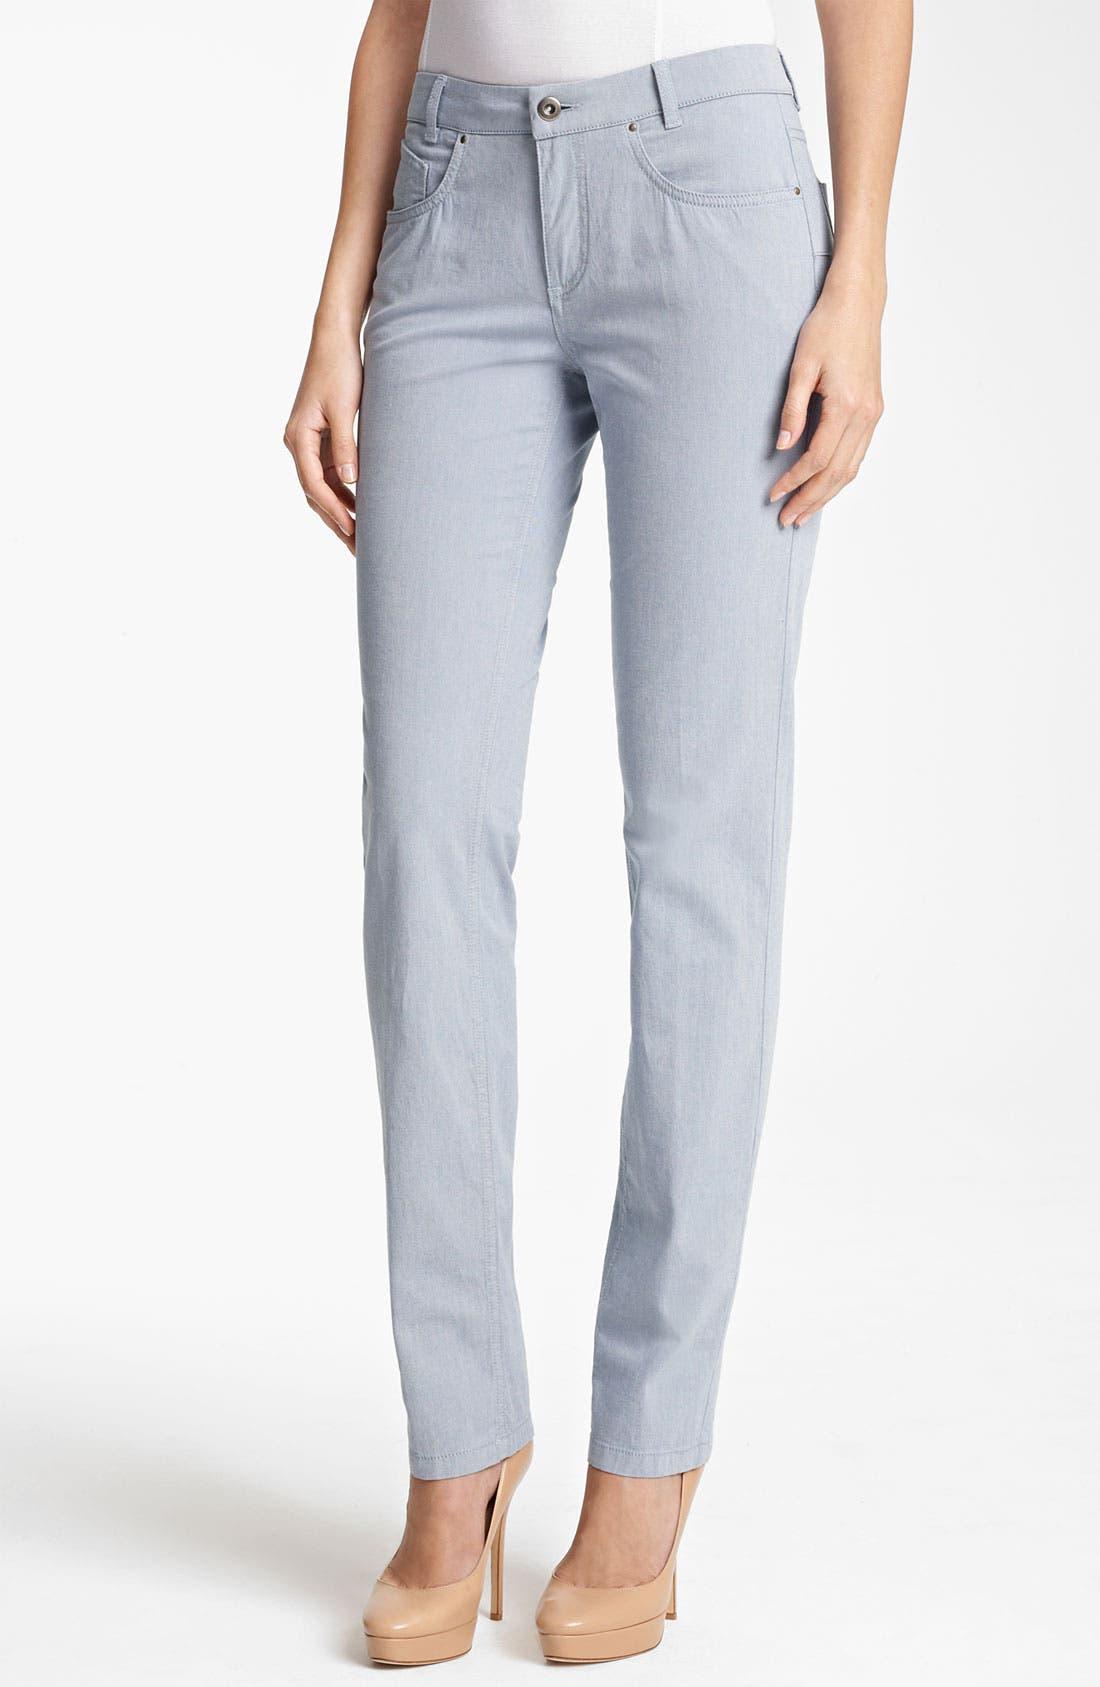 Alternate Image 1 Selected - Fabiana Filippi Slim Stretch Jeans